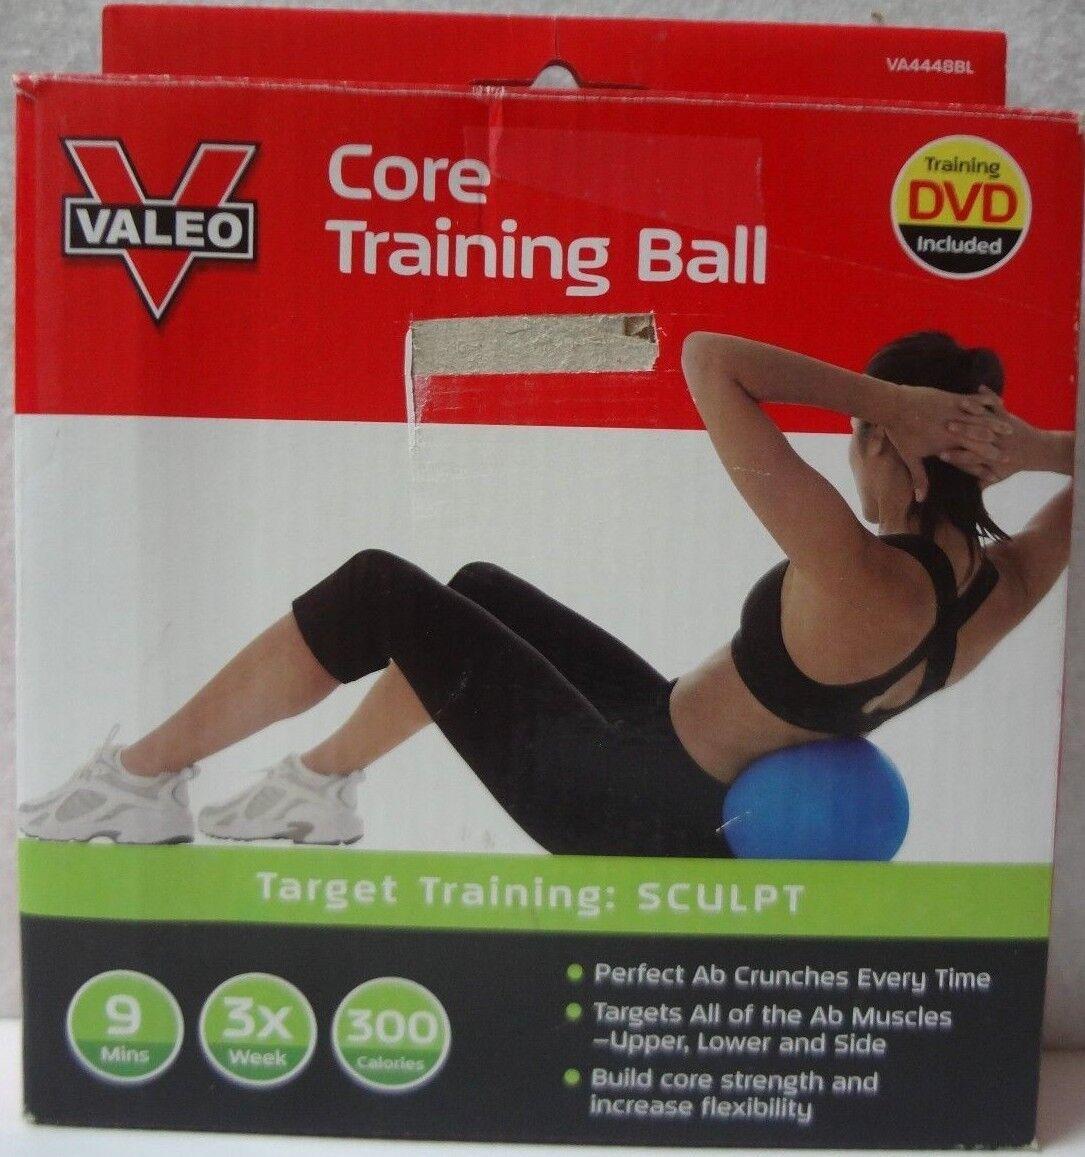 Valeo 9-inch Core Training Ball To Help Improve Your Balance